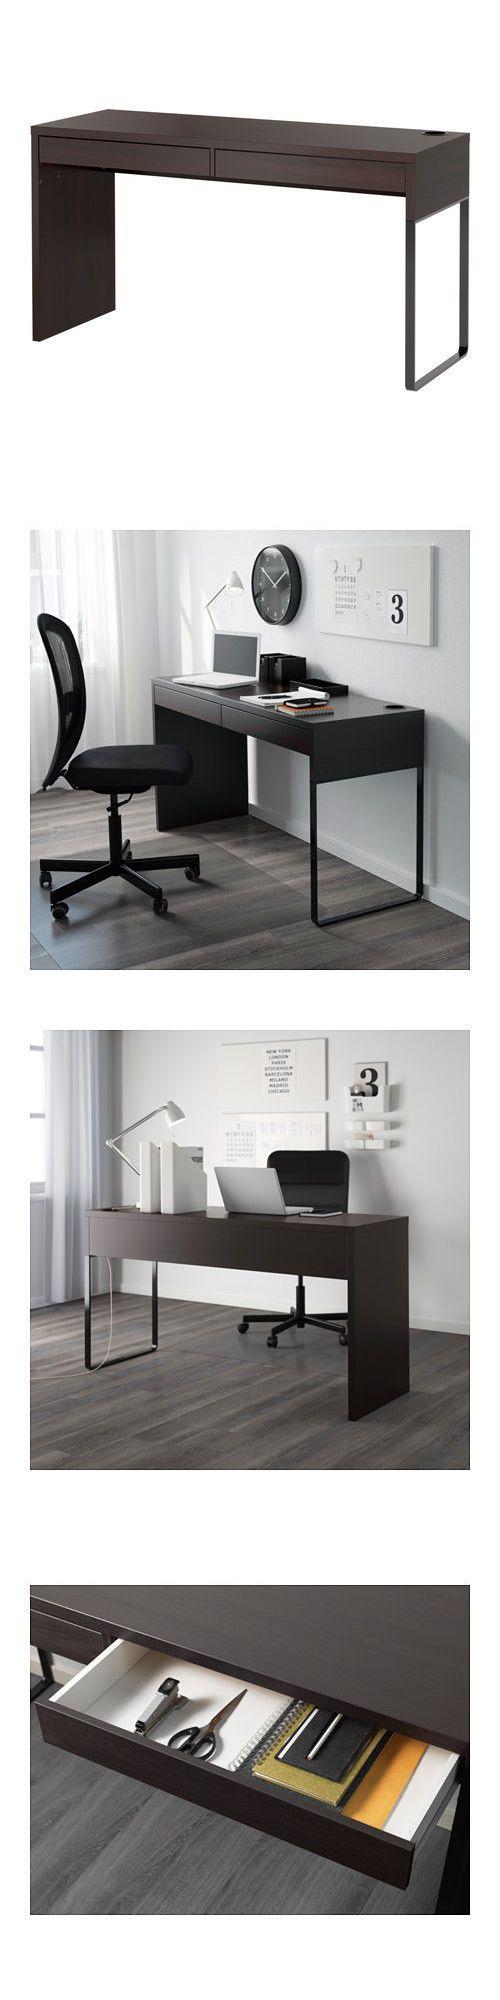 The 25 best micke desk ideas on pinterest ikea small desk desk space and desk areas - Micke computer workstation ...